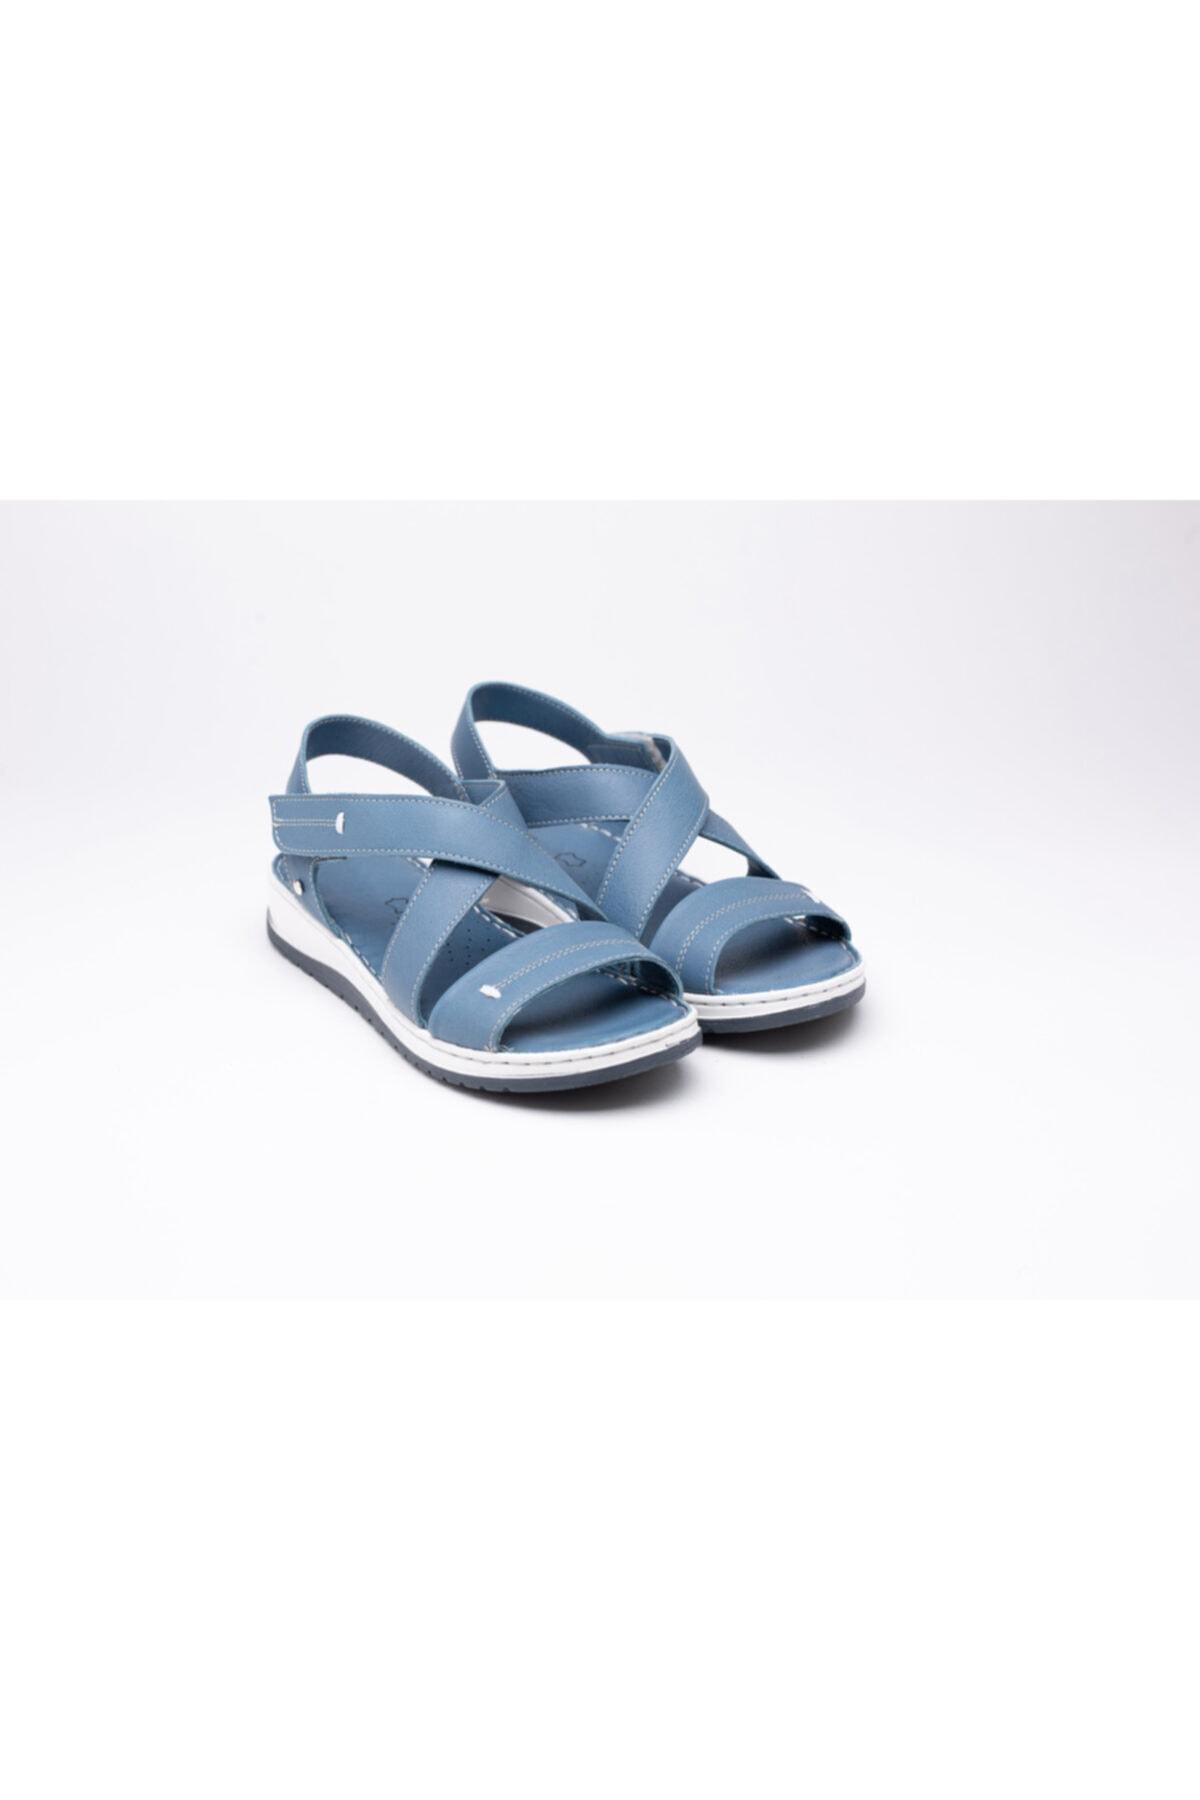 خرید نقدی صندل دخترانه ترک برند Otantik Ayakkabı رنگ آبی کد ty100125421